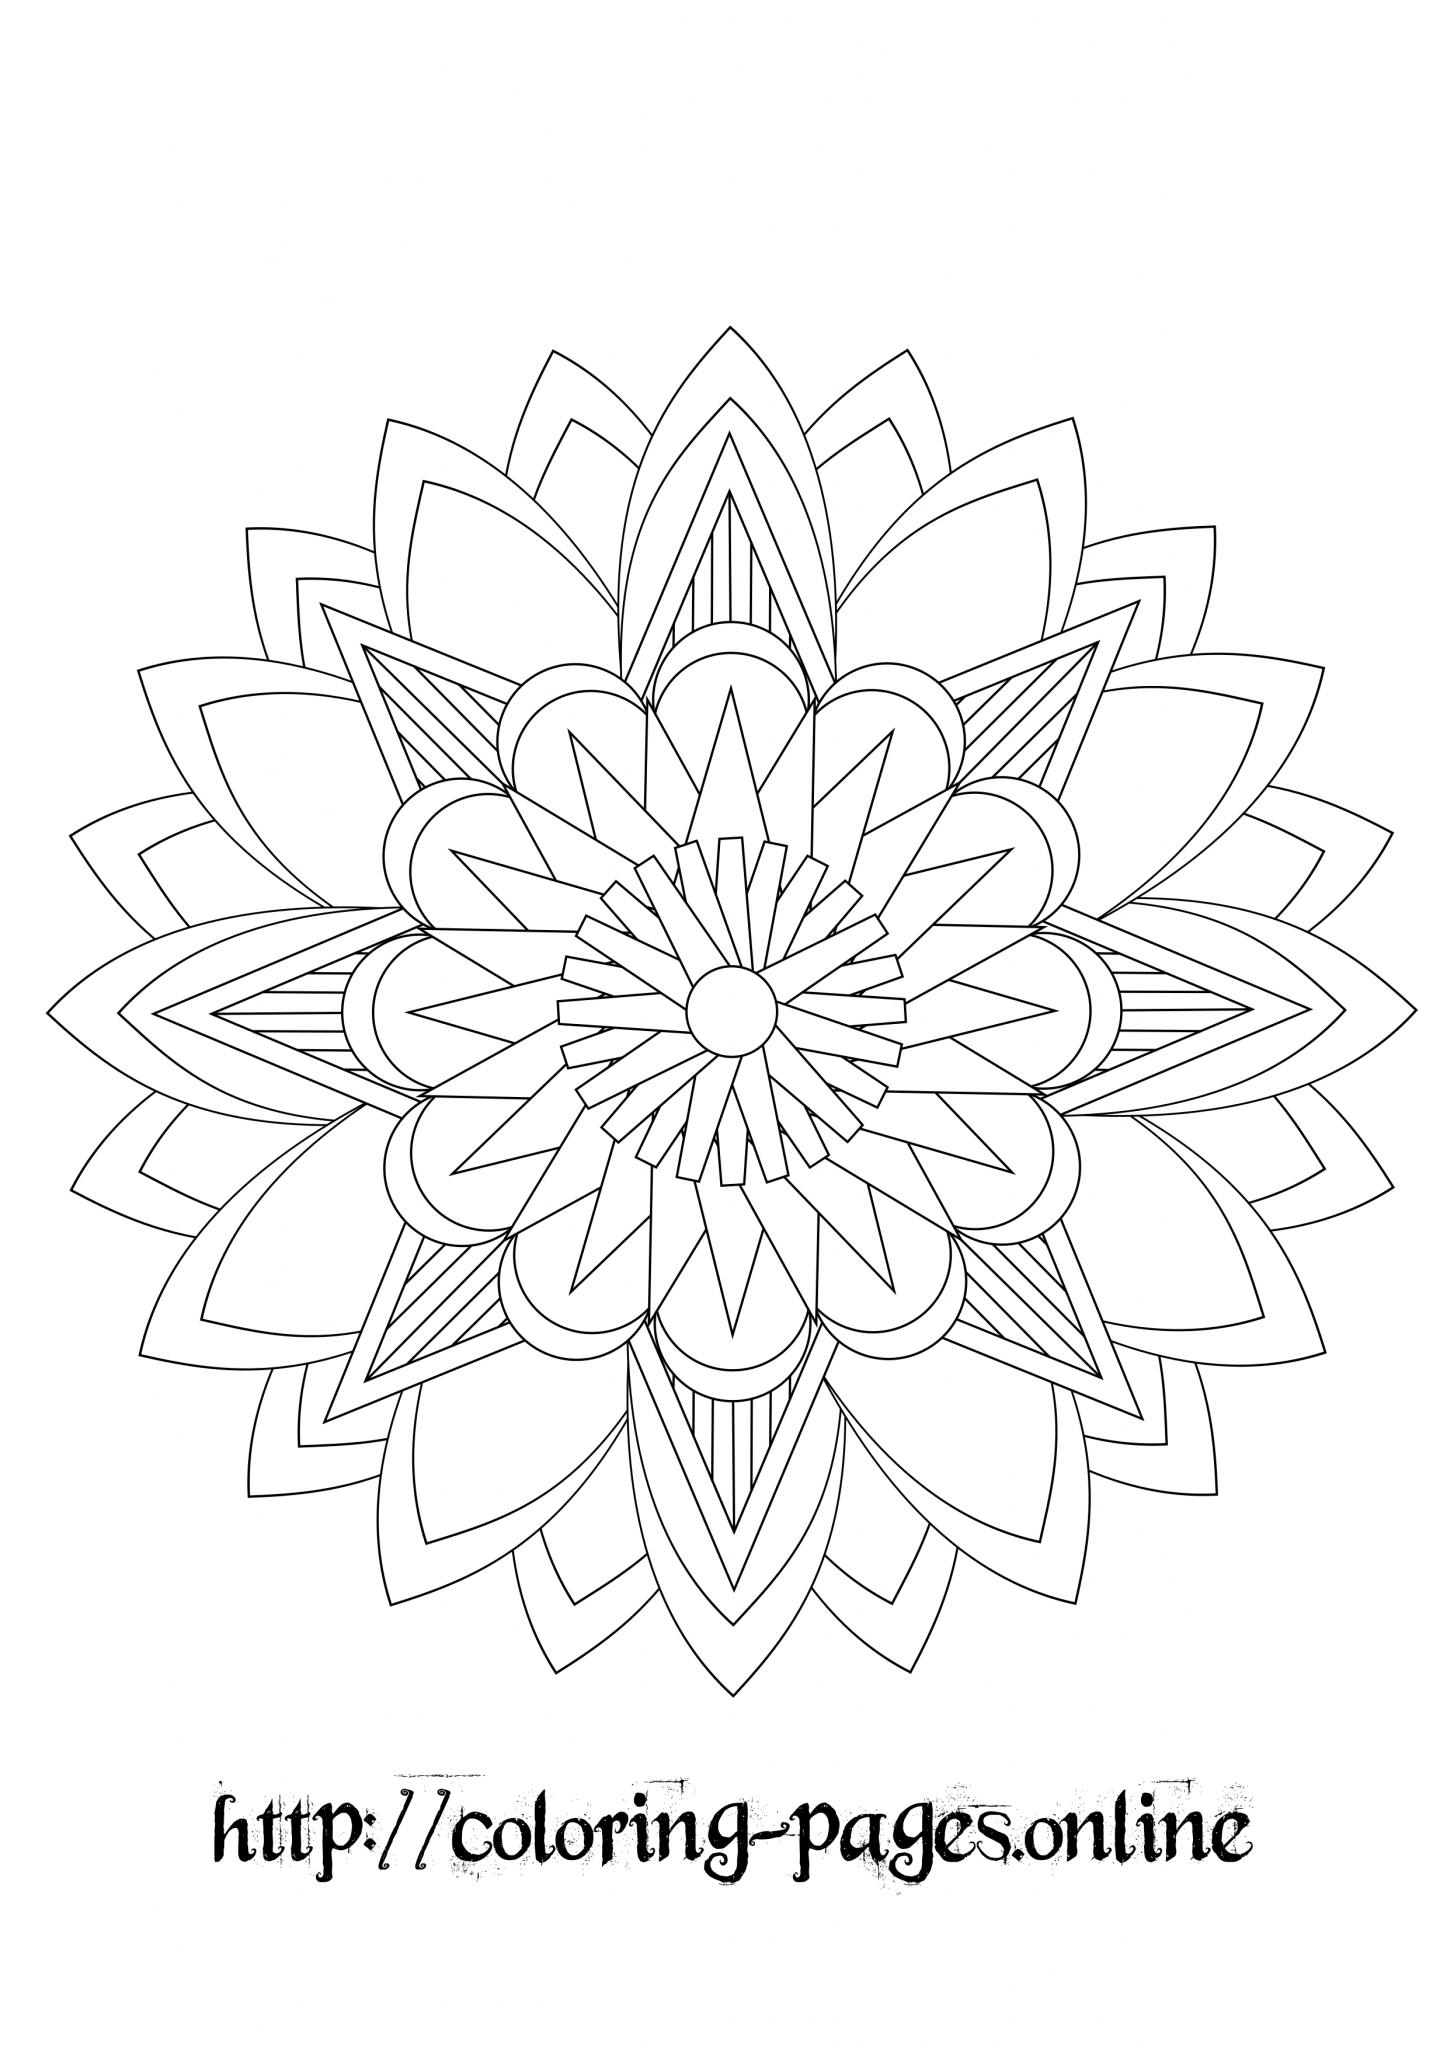 Pointed mandala coloring page